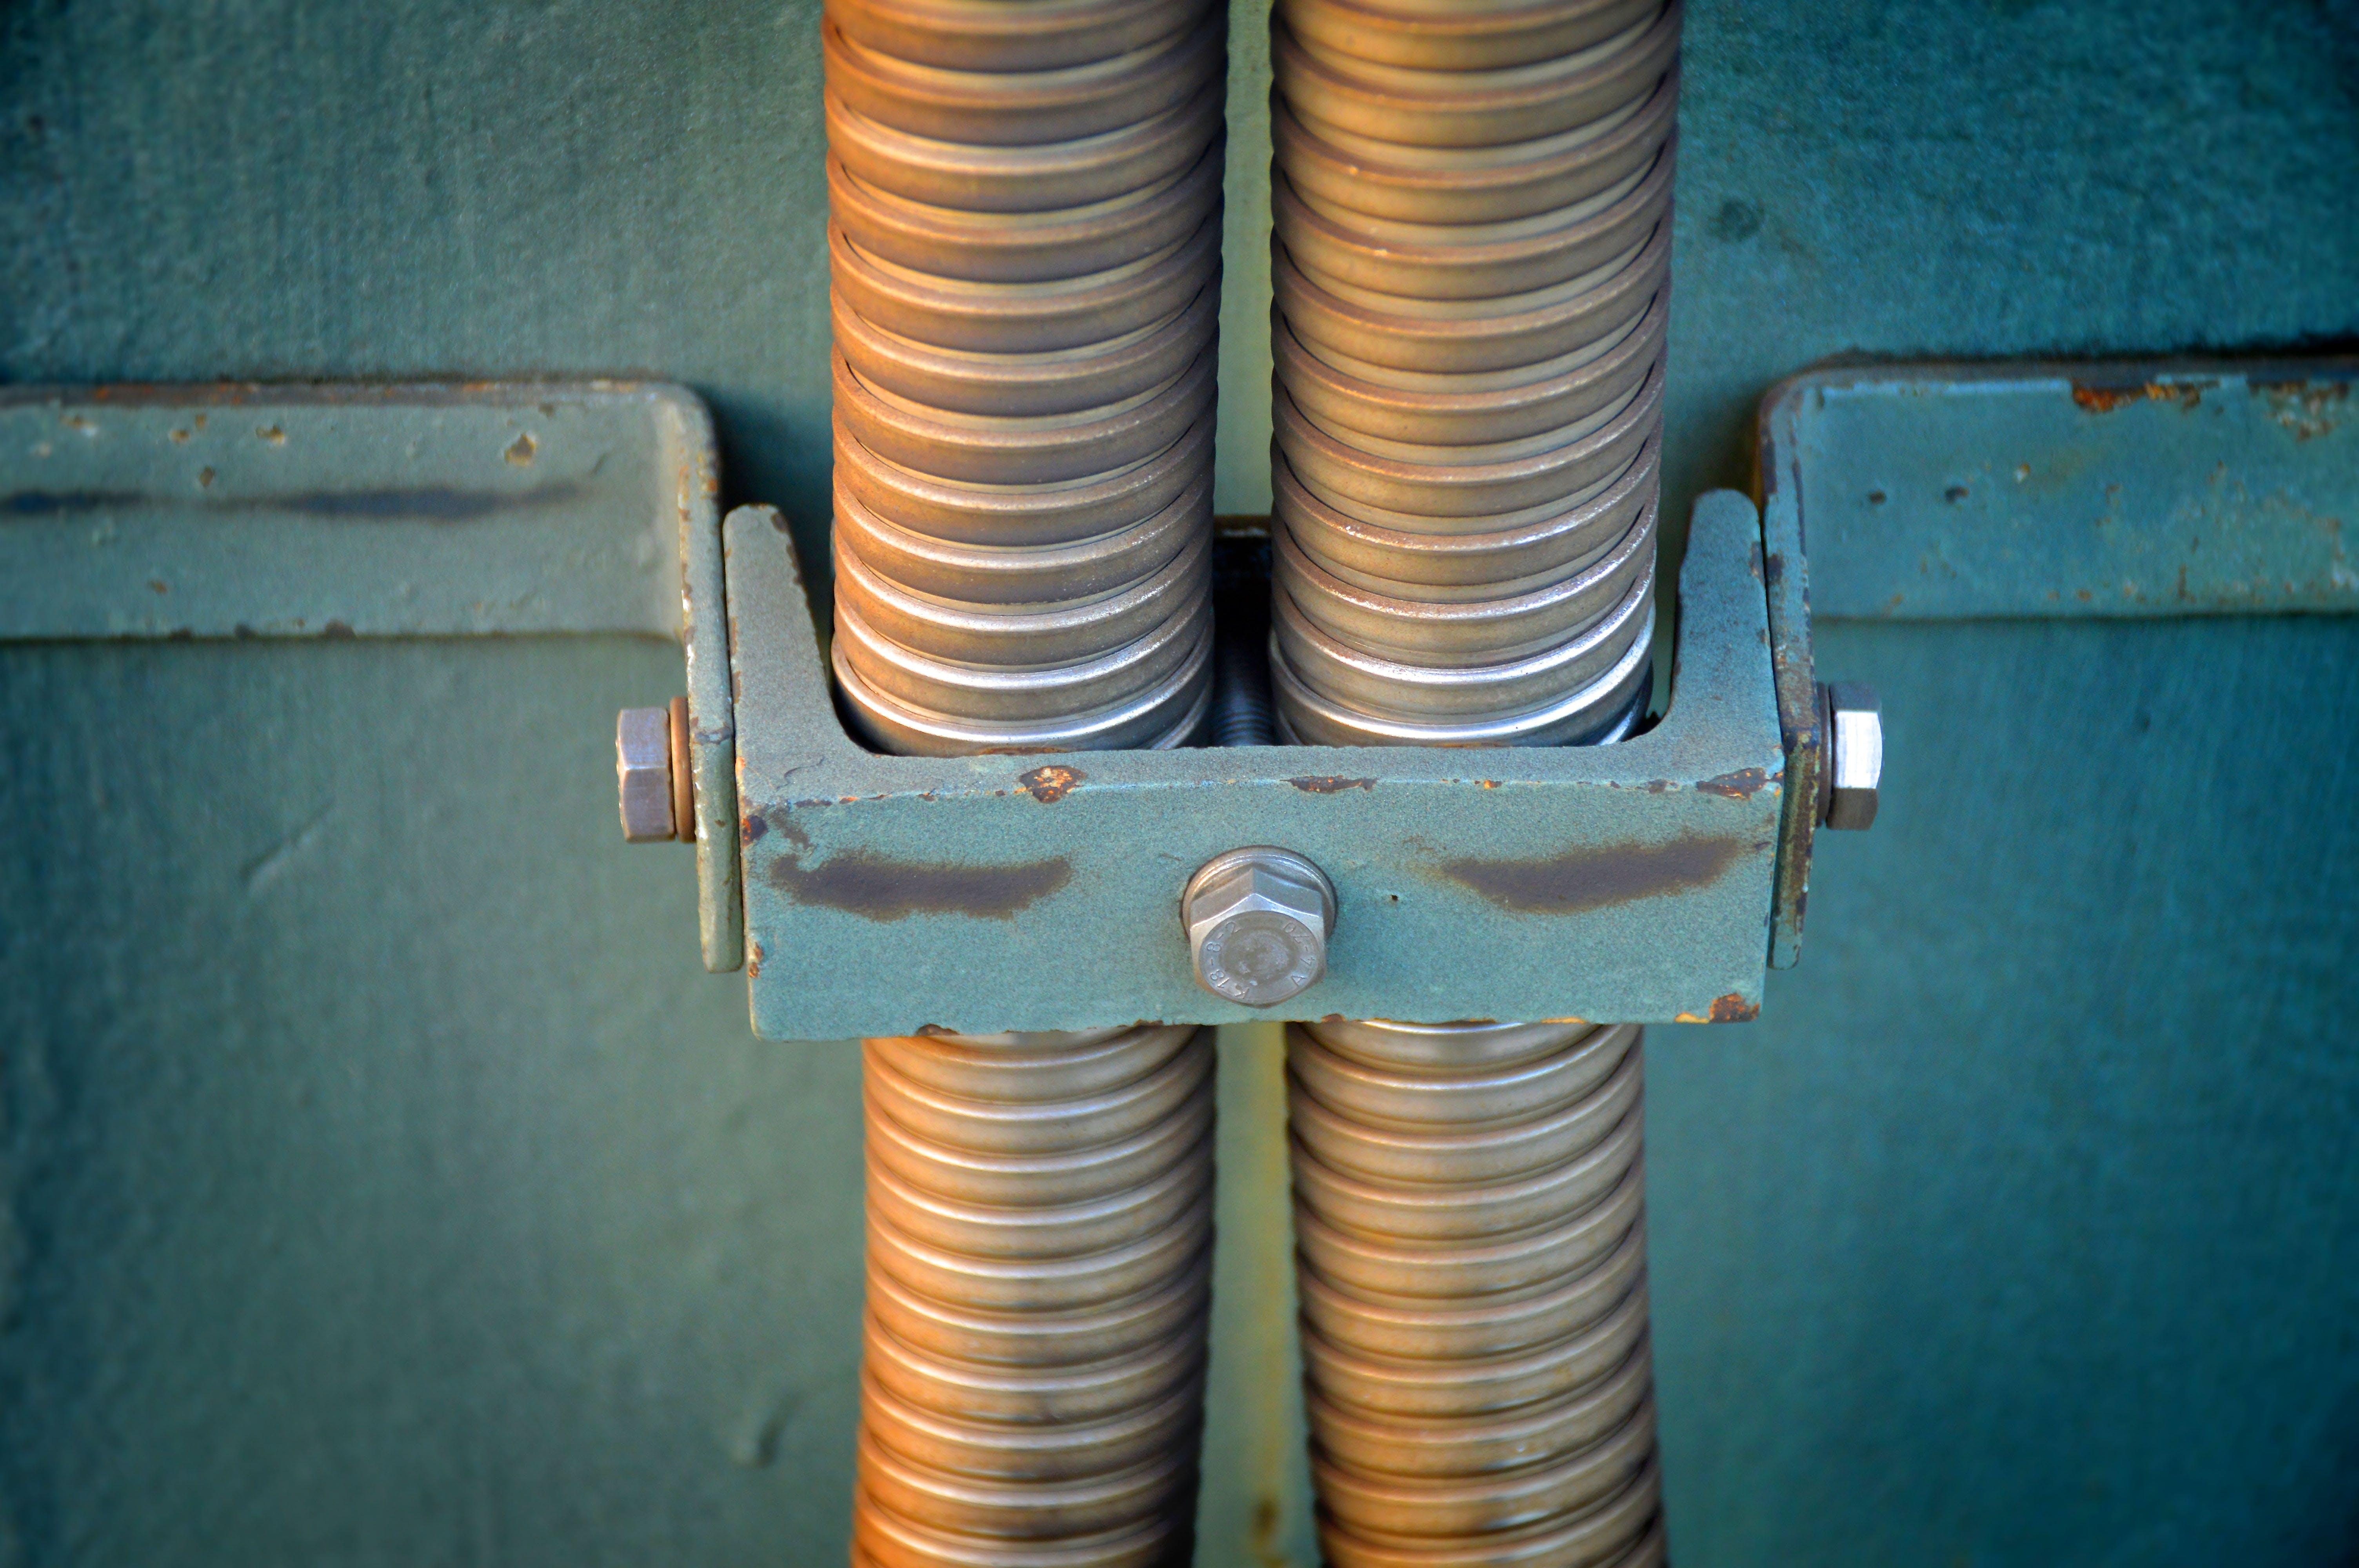 Closeup Photo of Gray Pipes